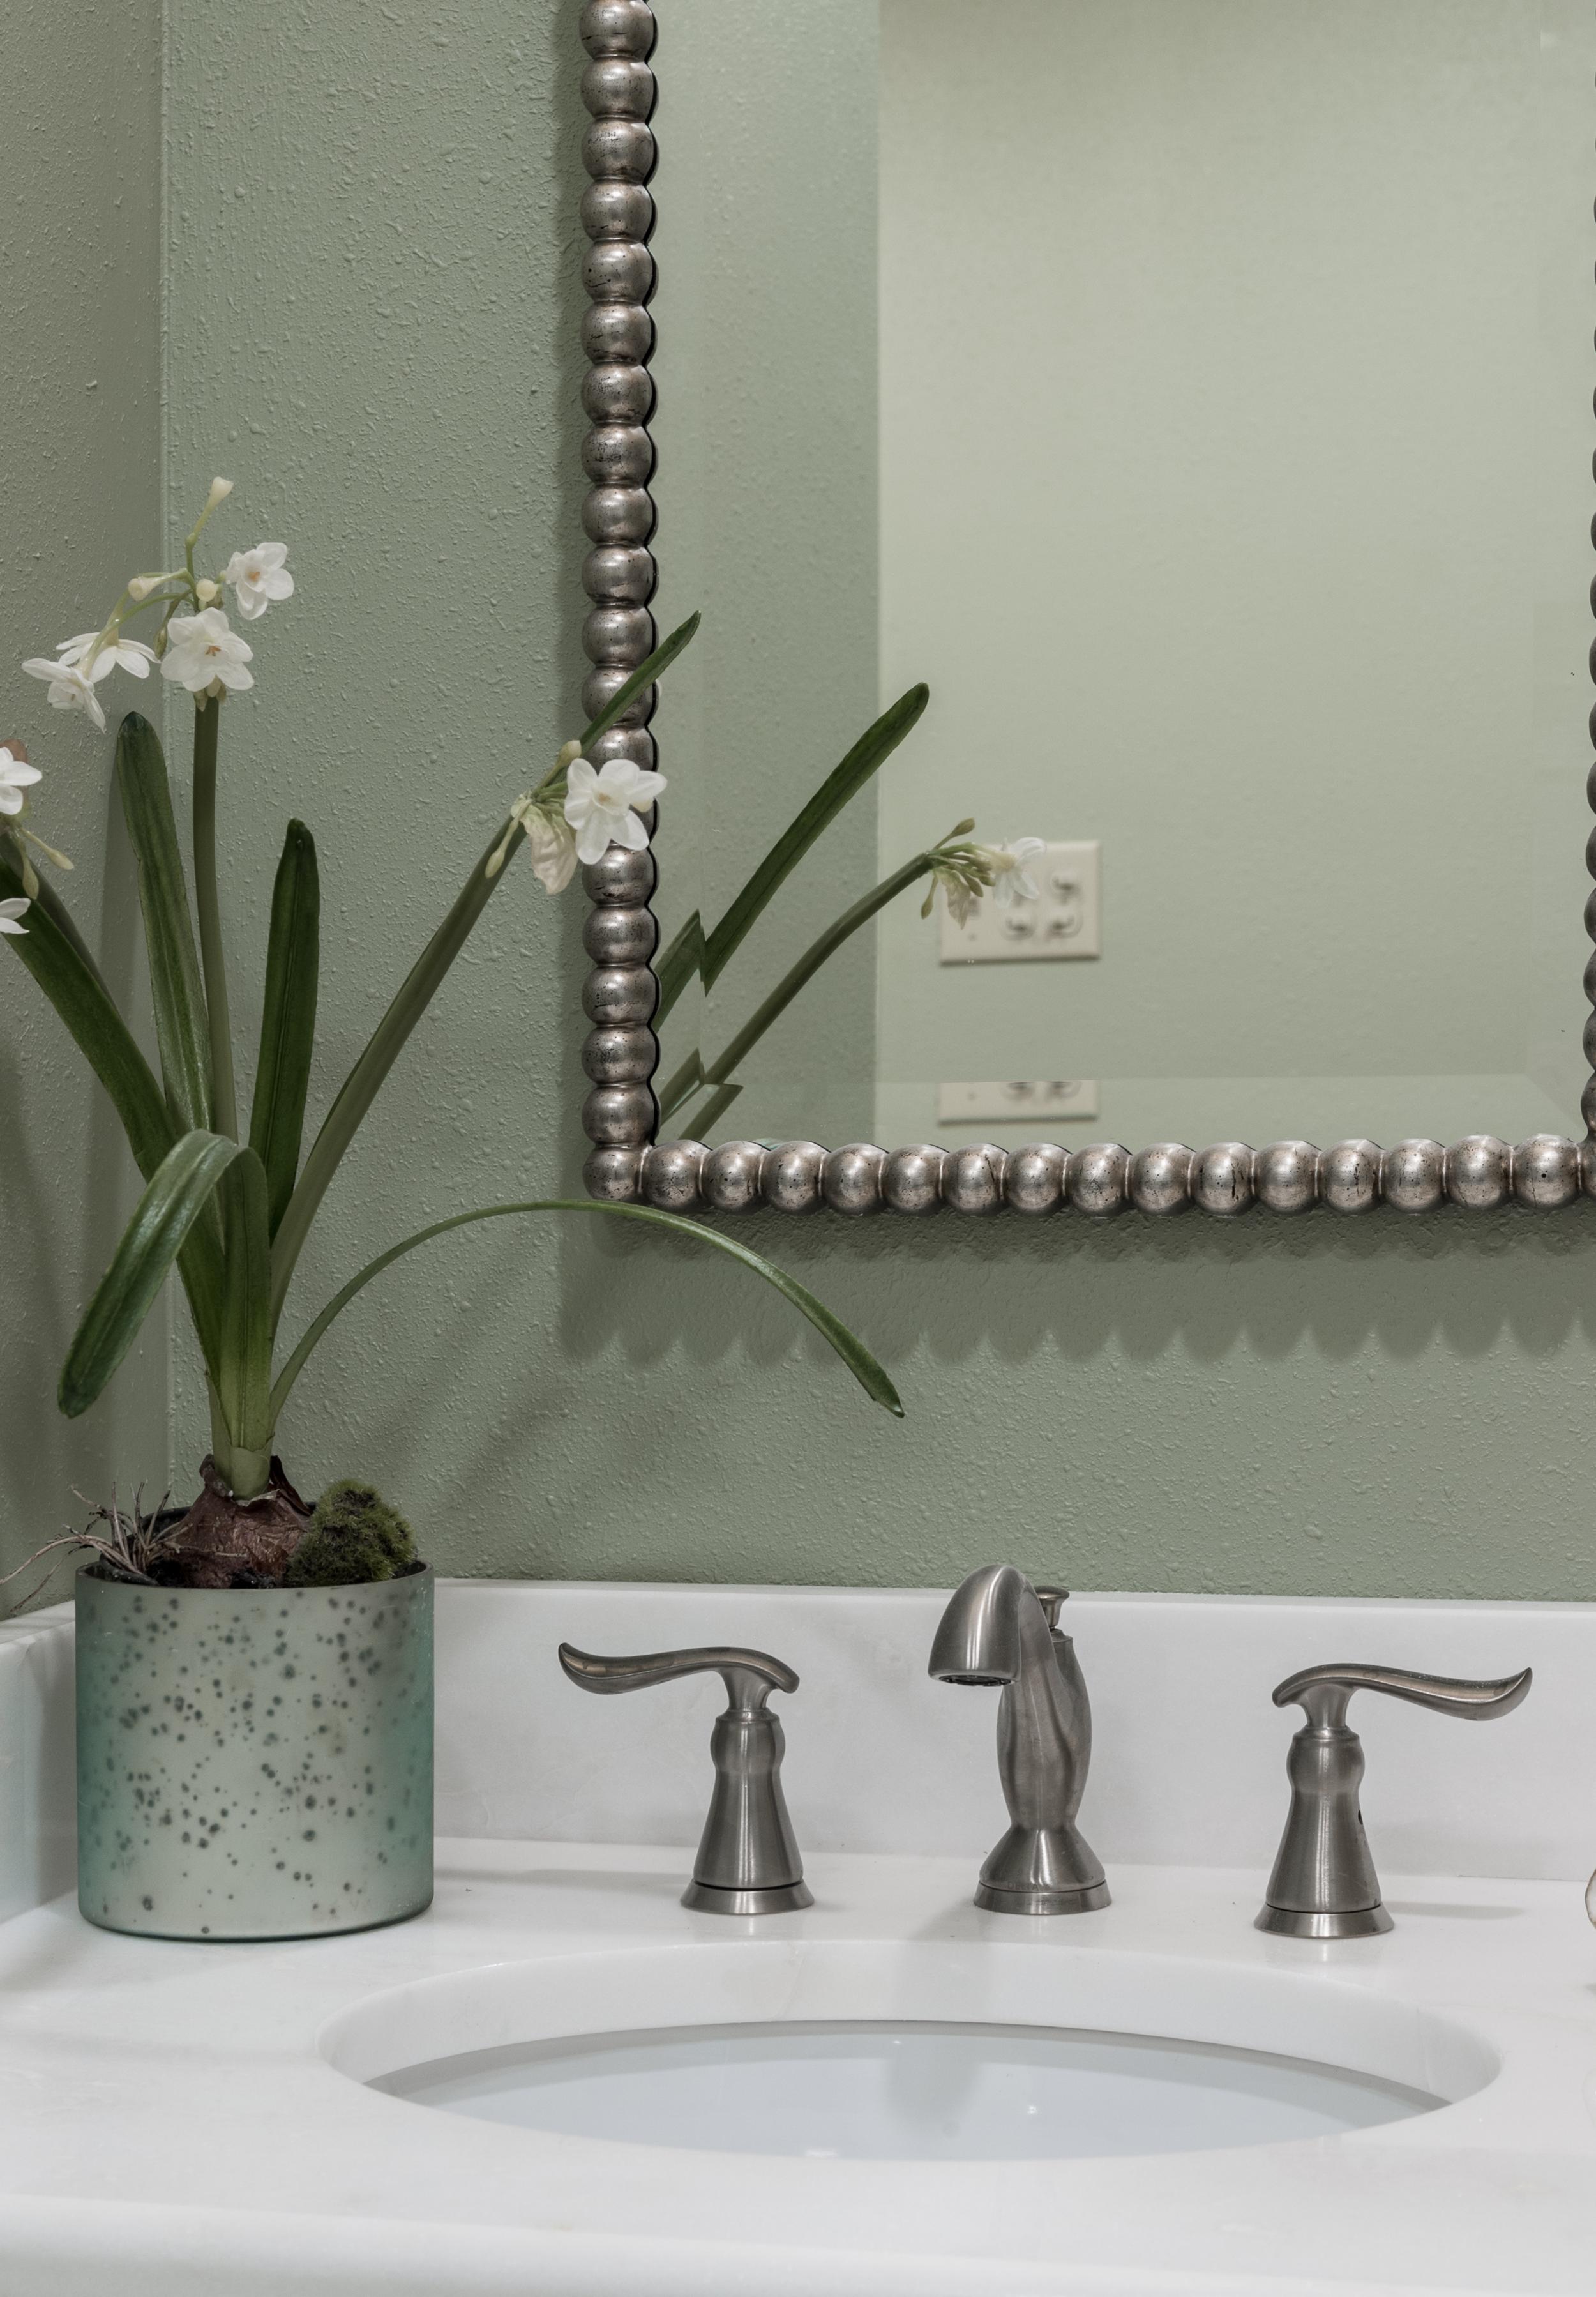 bathroom vanity mirror new orleans best interior designers khb interiors